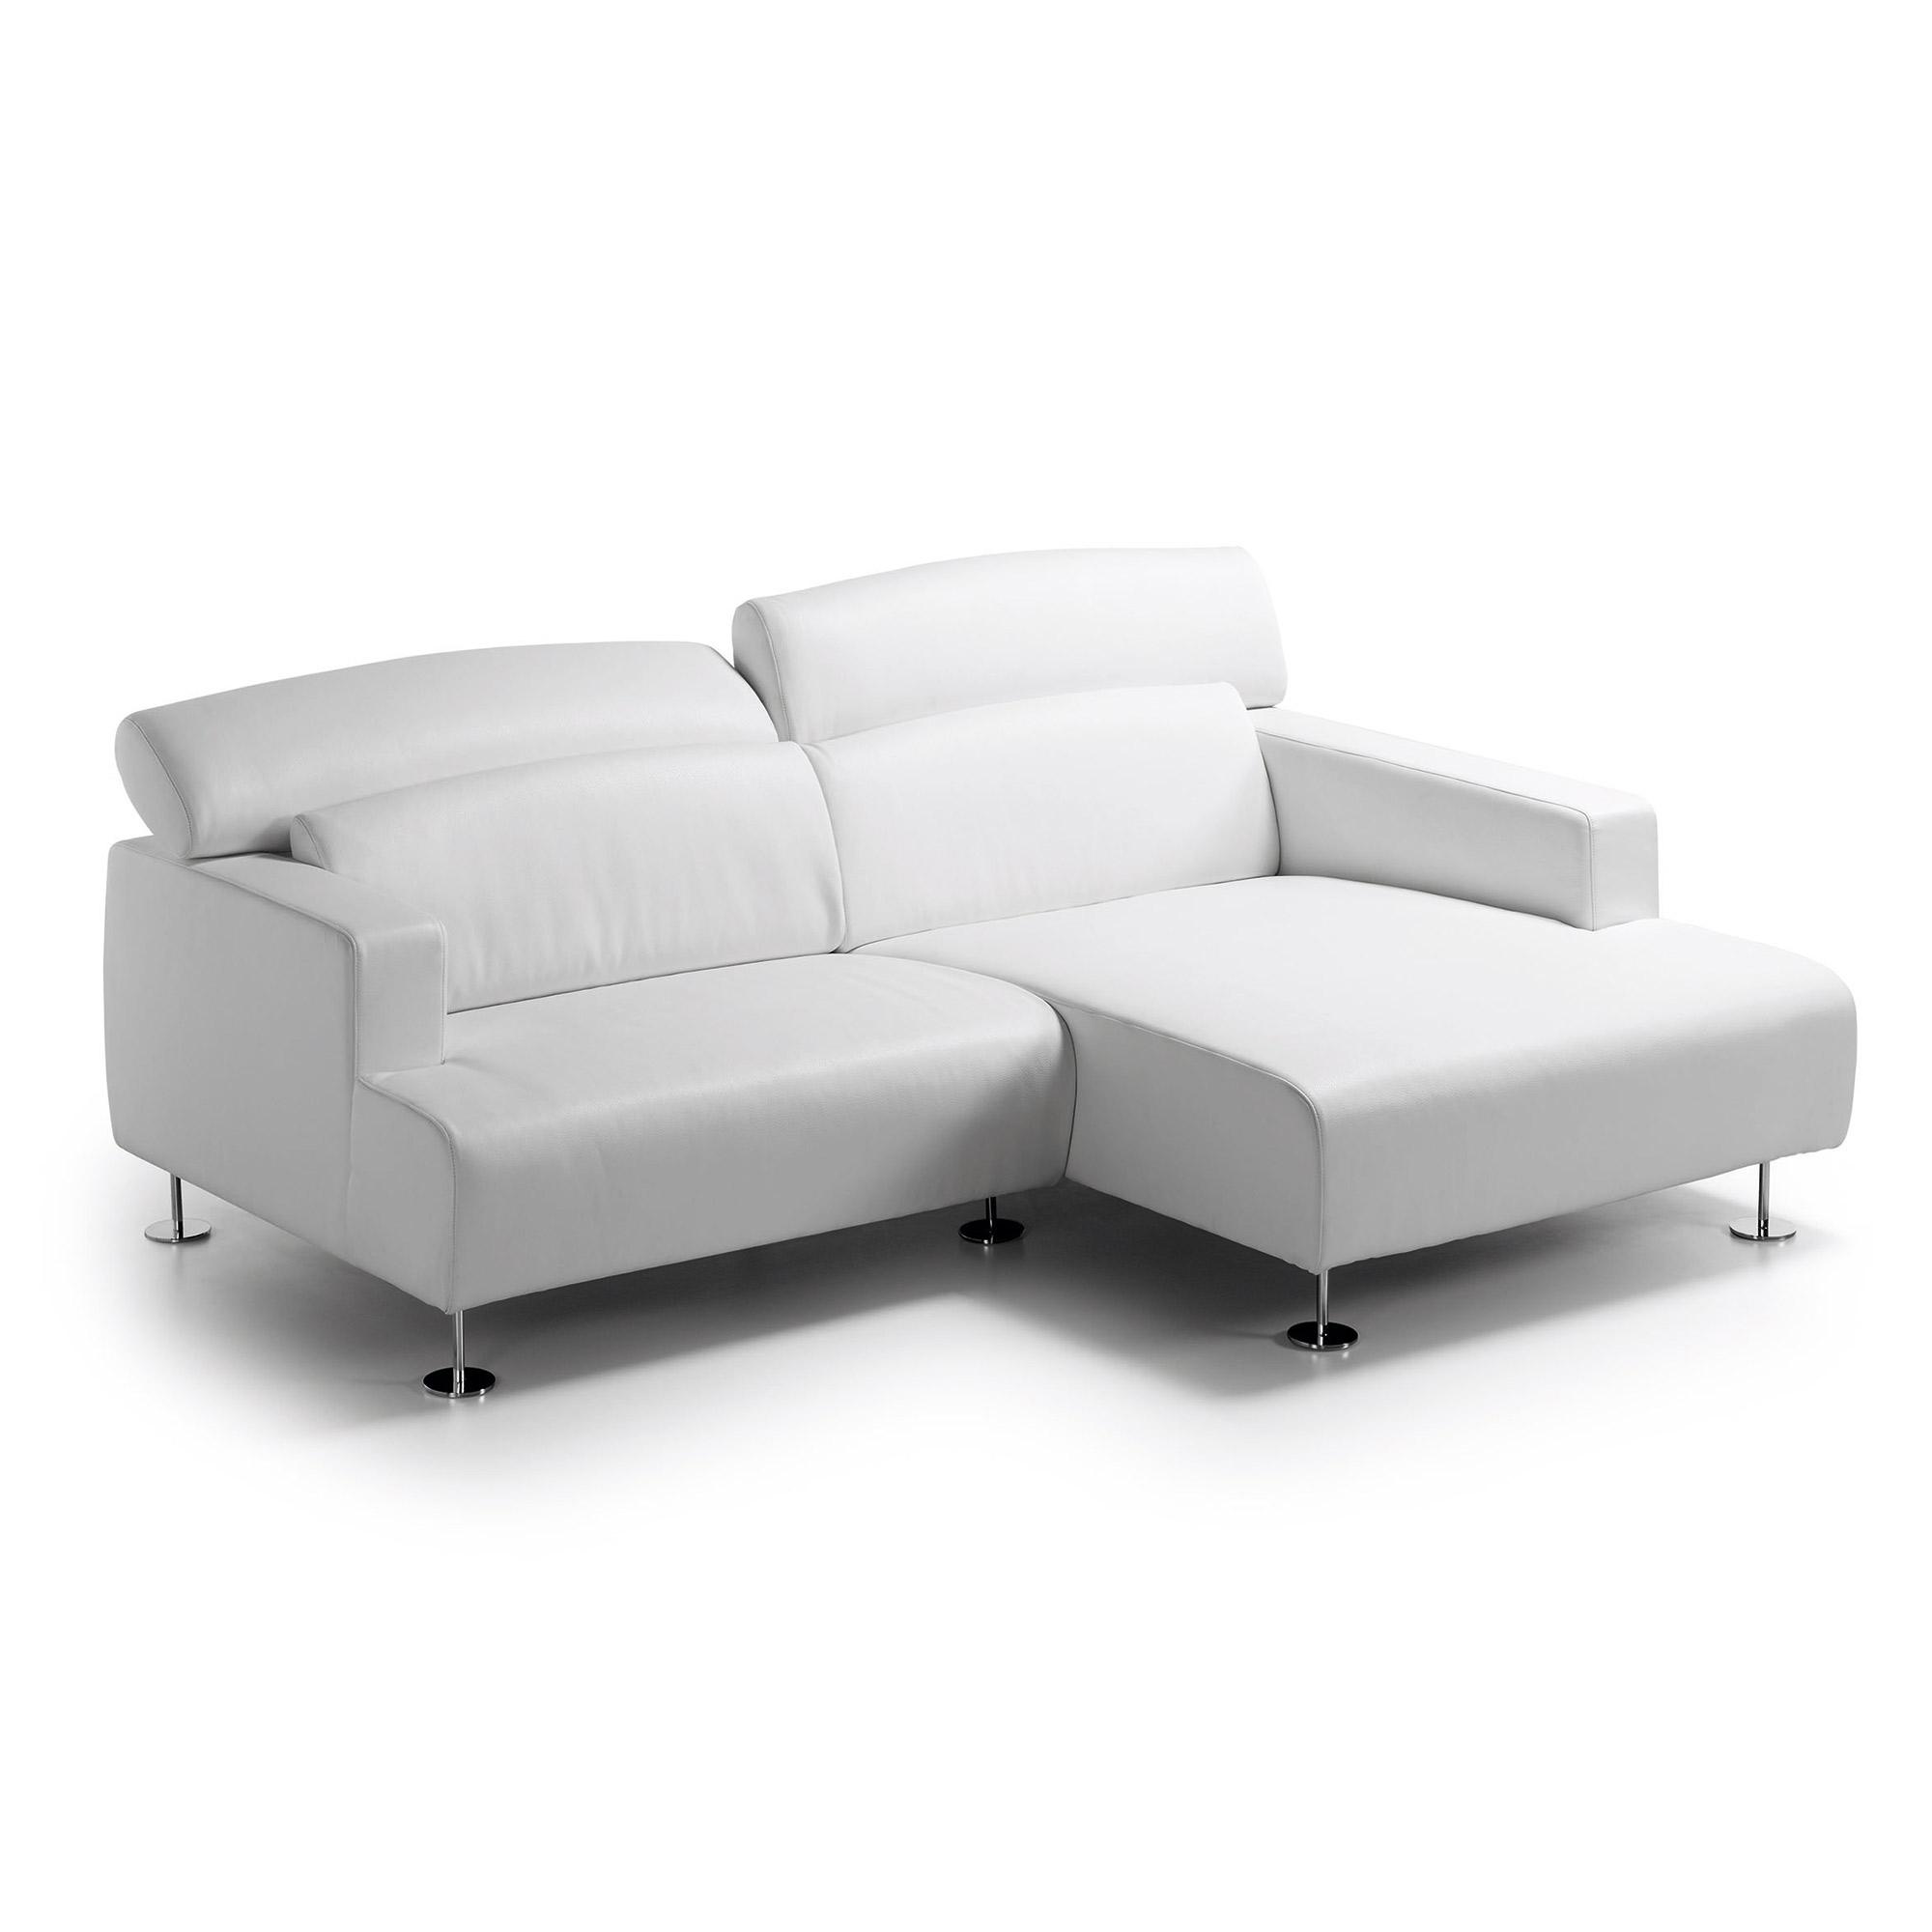 living sofa 3 p chaise dcha recl eco piel blanco puro. Black Bedroom Furniture Sets. Home Design Ideas